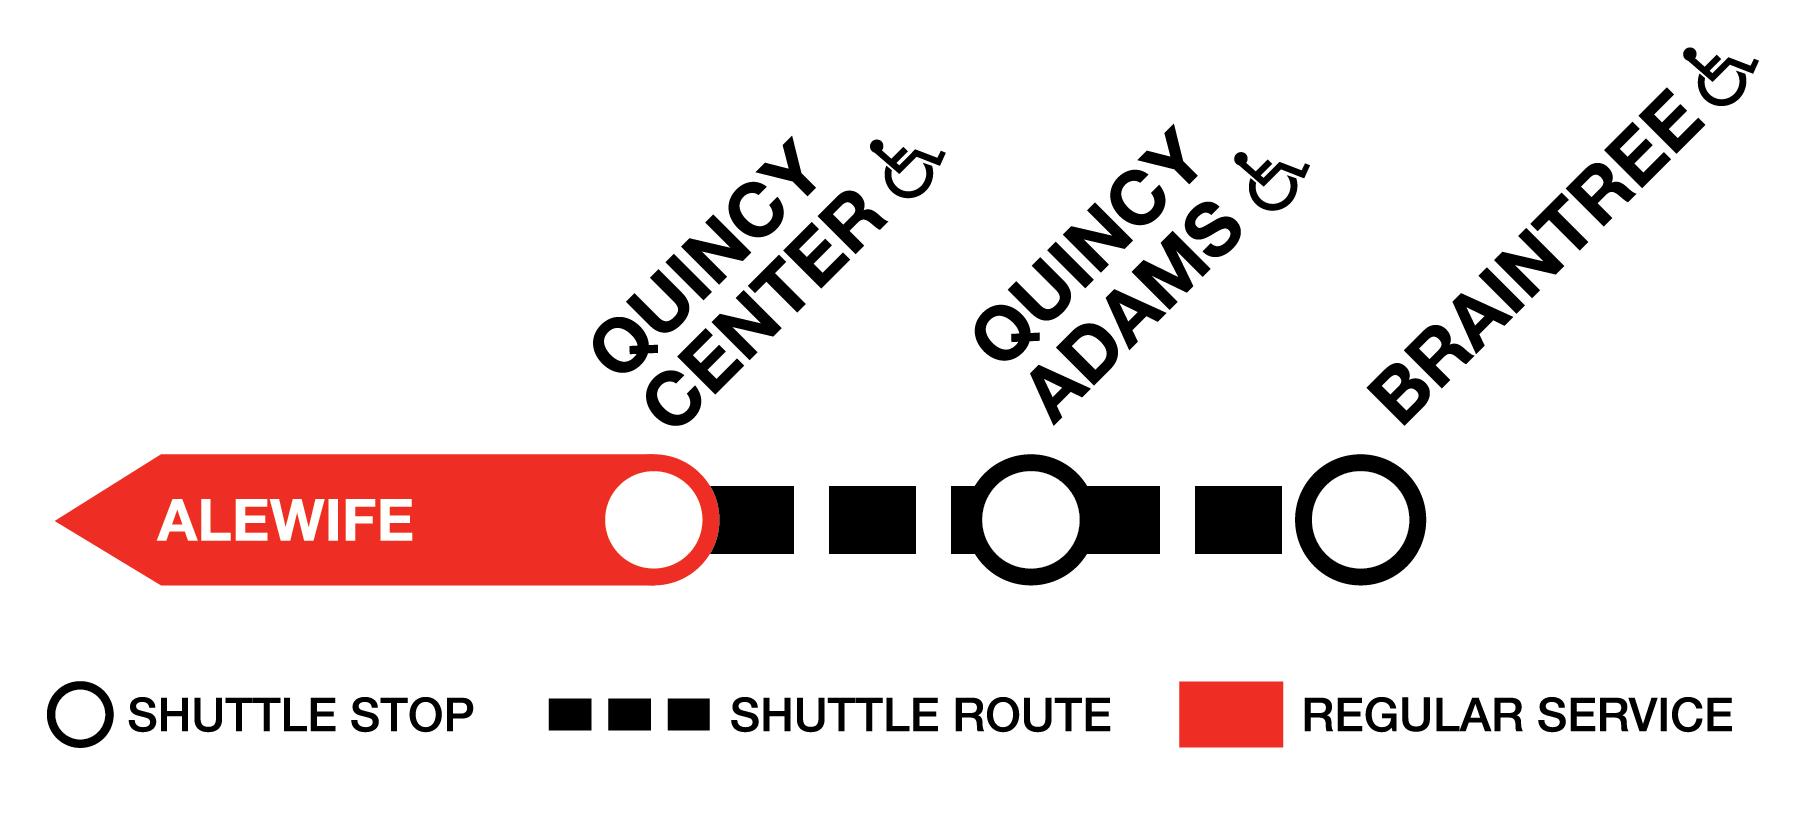 Shuttle diagram showing shuttles running between Quincy Center and Braintree